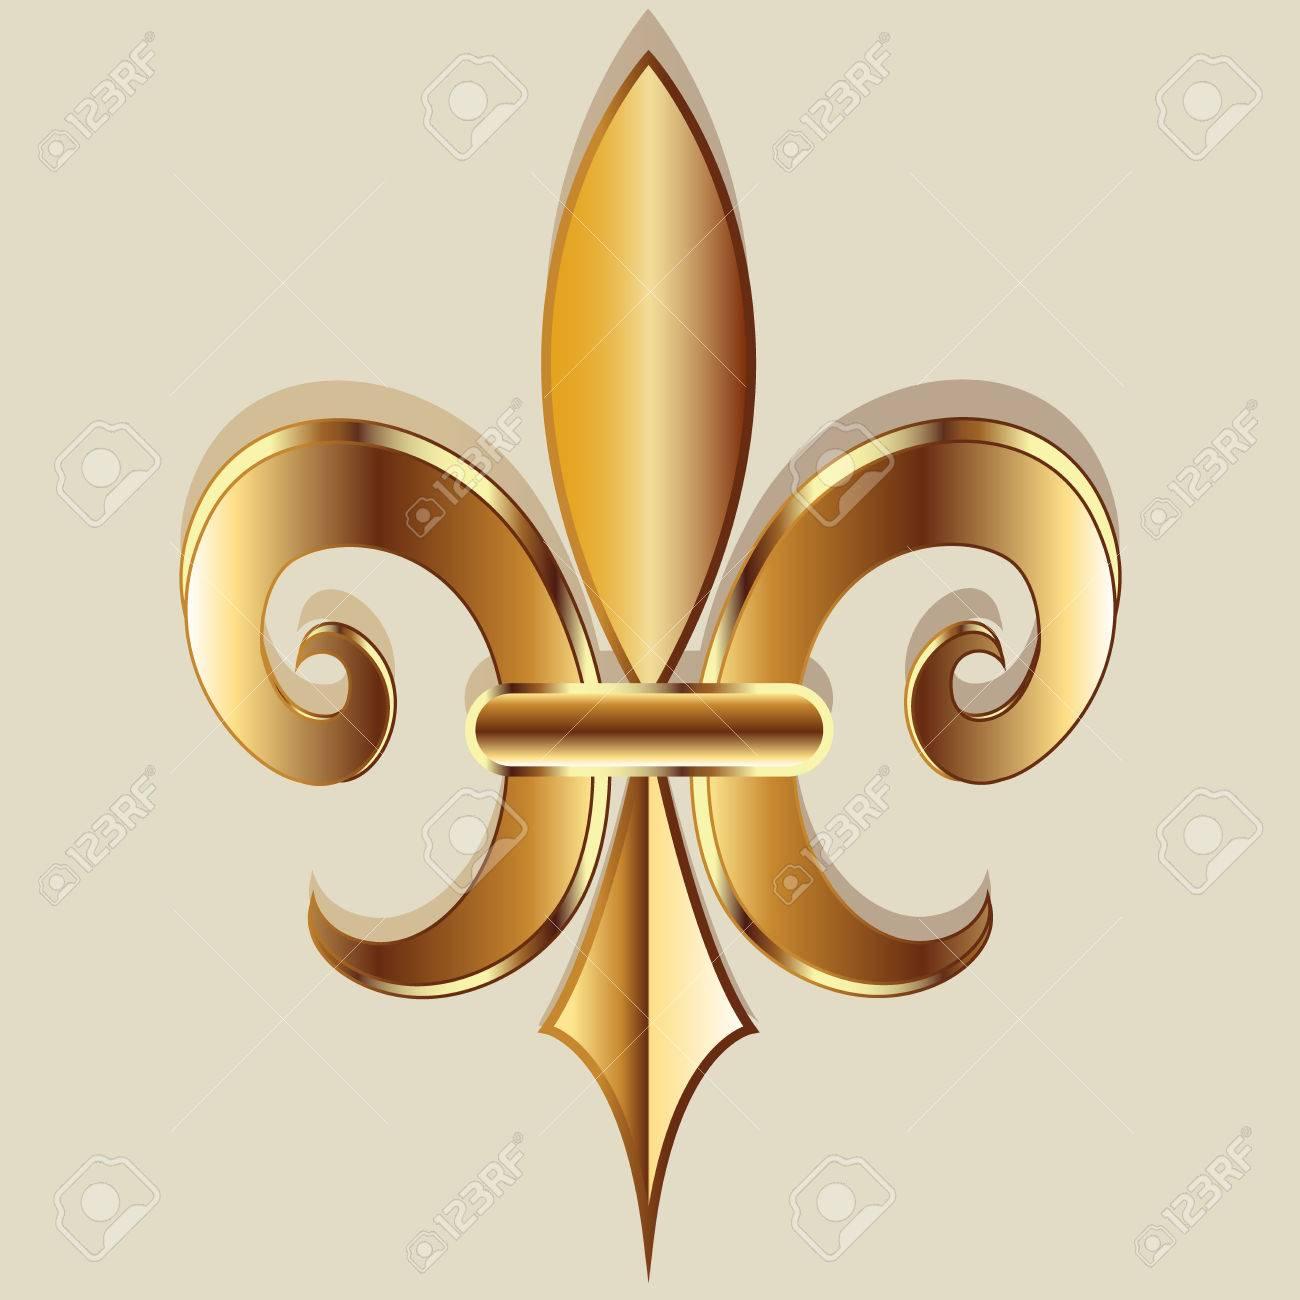 Gold Elegant Fleur De Lis Flower Symbol Logo Icon Vector Image Template Stock